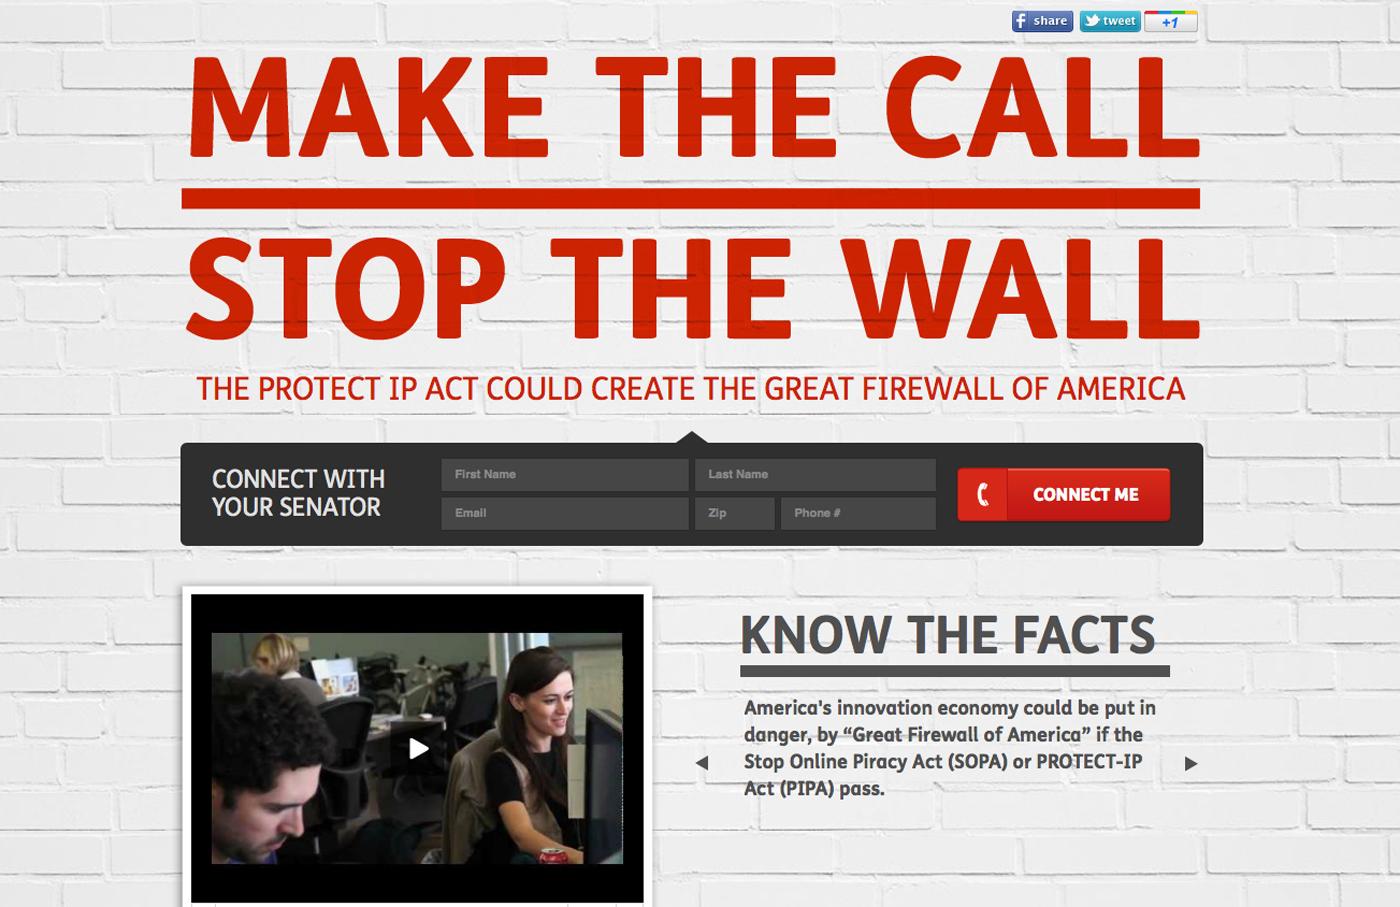 make_the_call_stop_the_wall.jpg